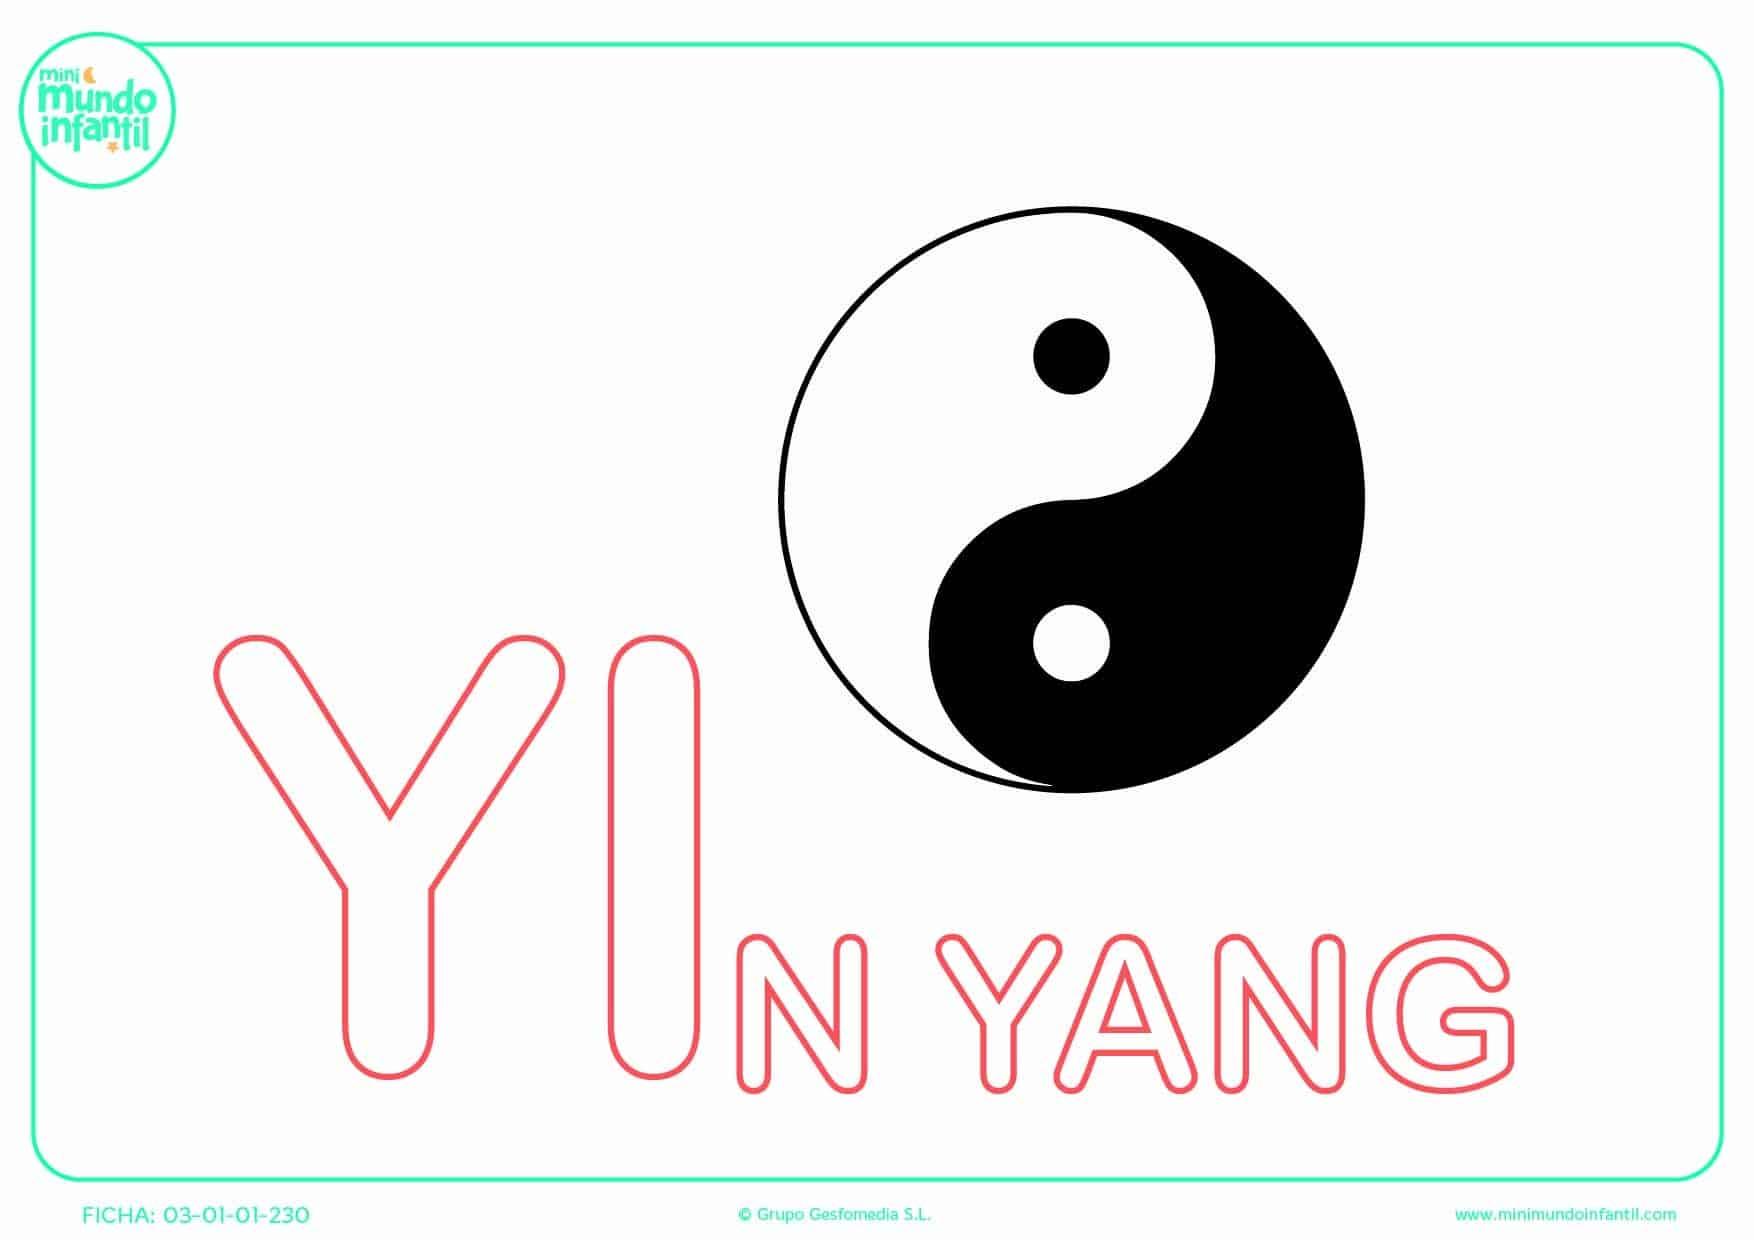 Sílaba YI mayúscula de yin yang para rellenar